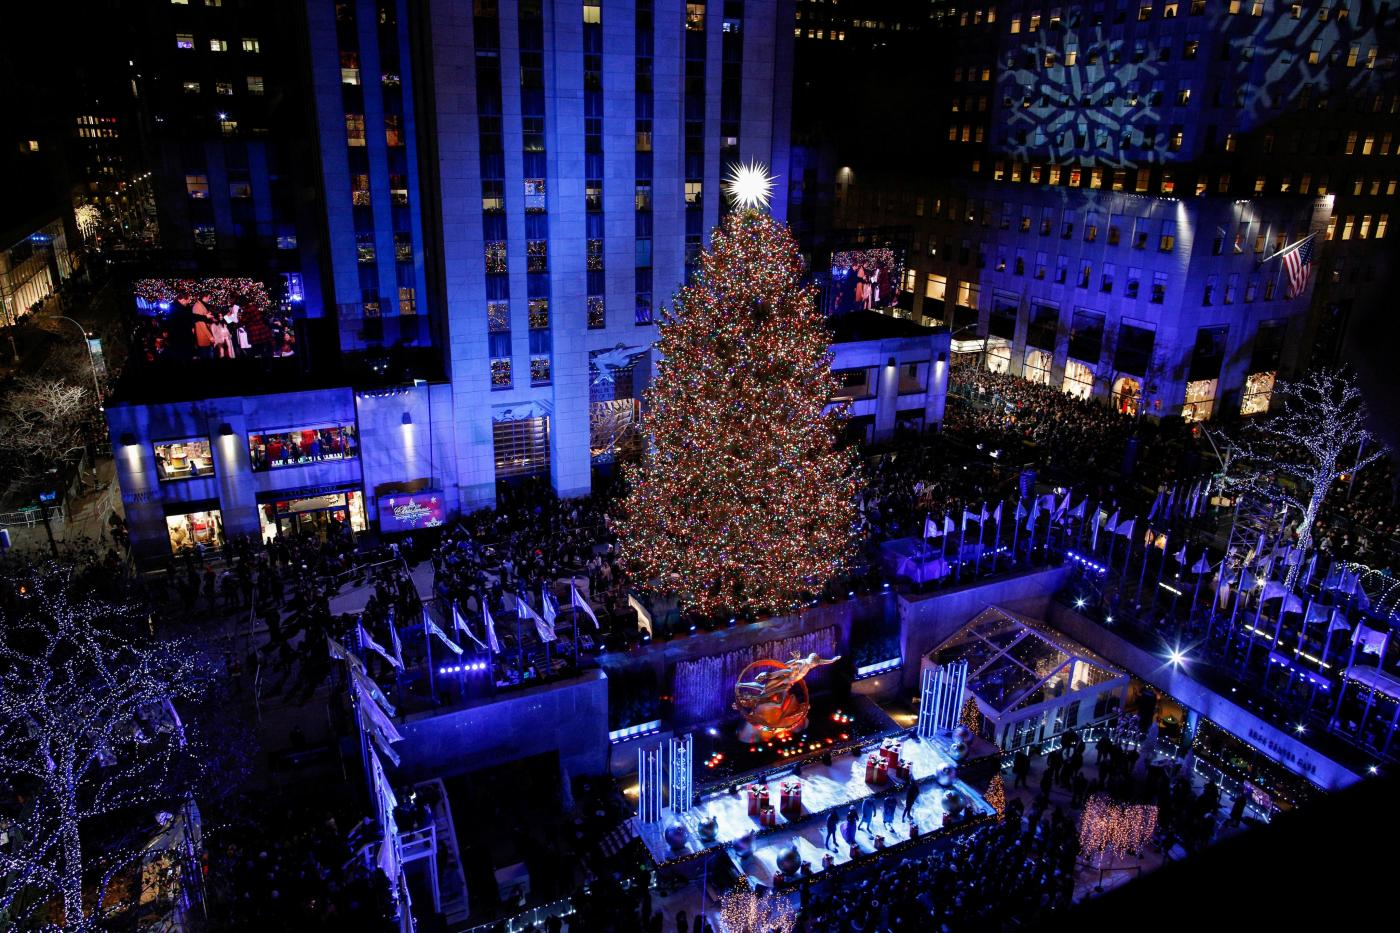 2018 Rockefeller Center Christmas Tree Lighting - Watch live ...